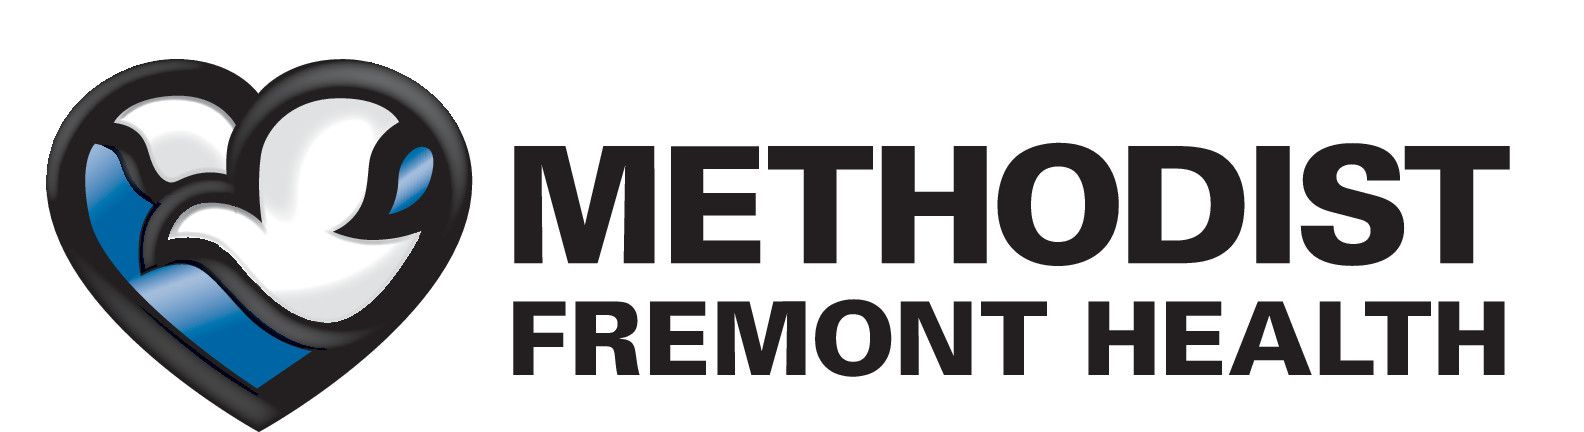 Methodist Fremont Health